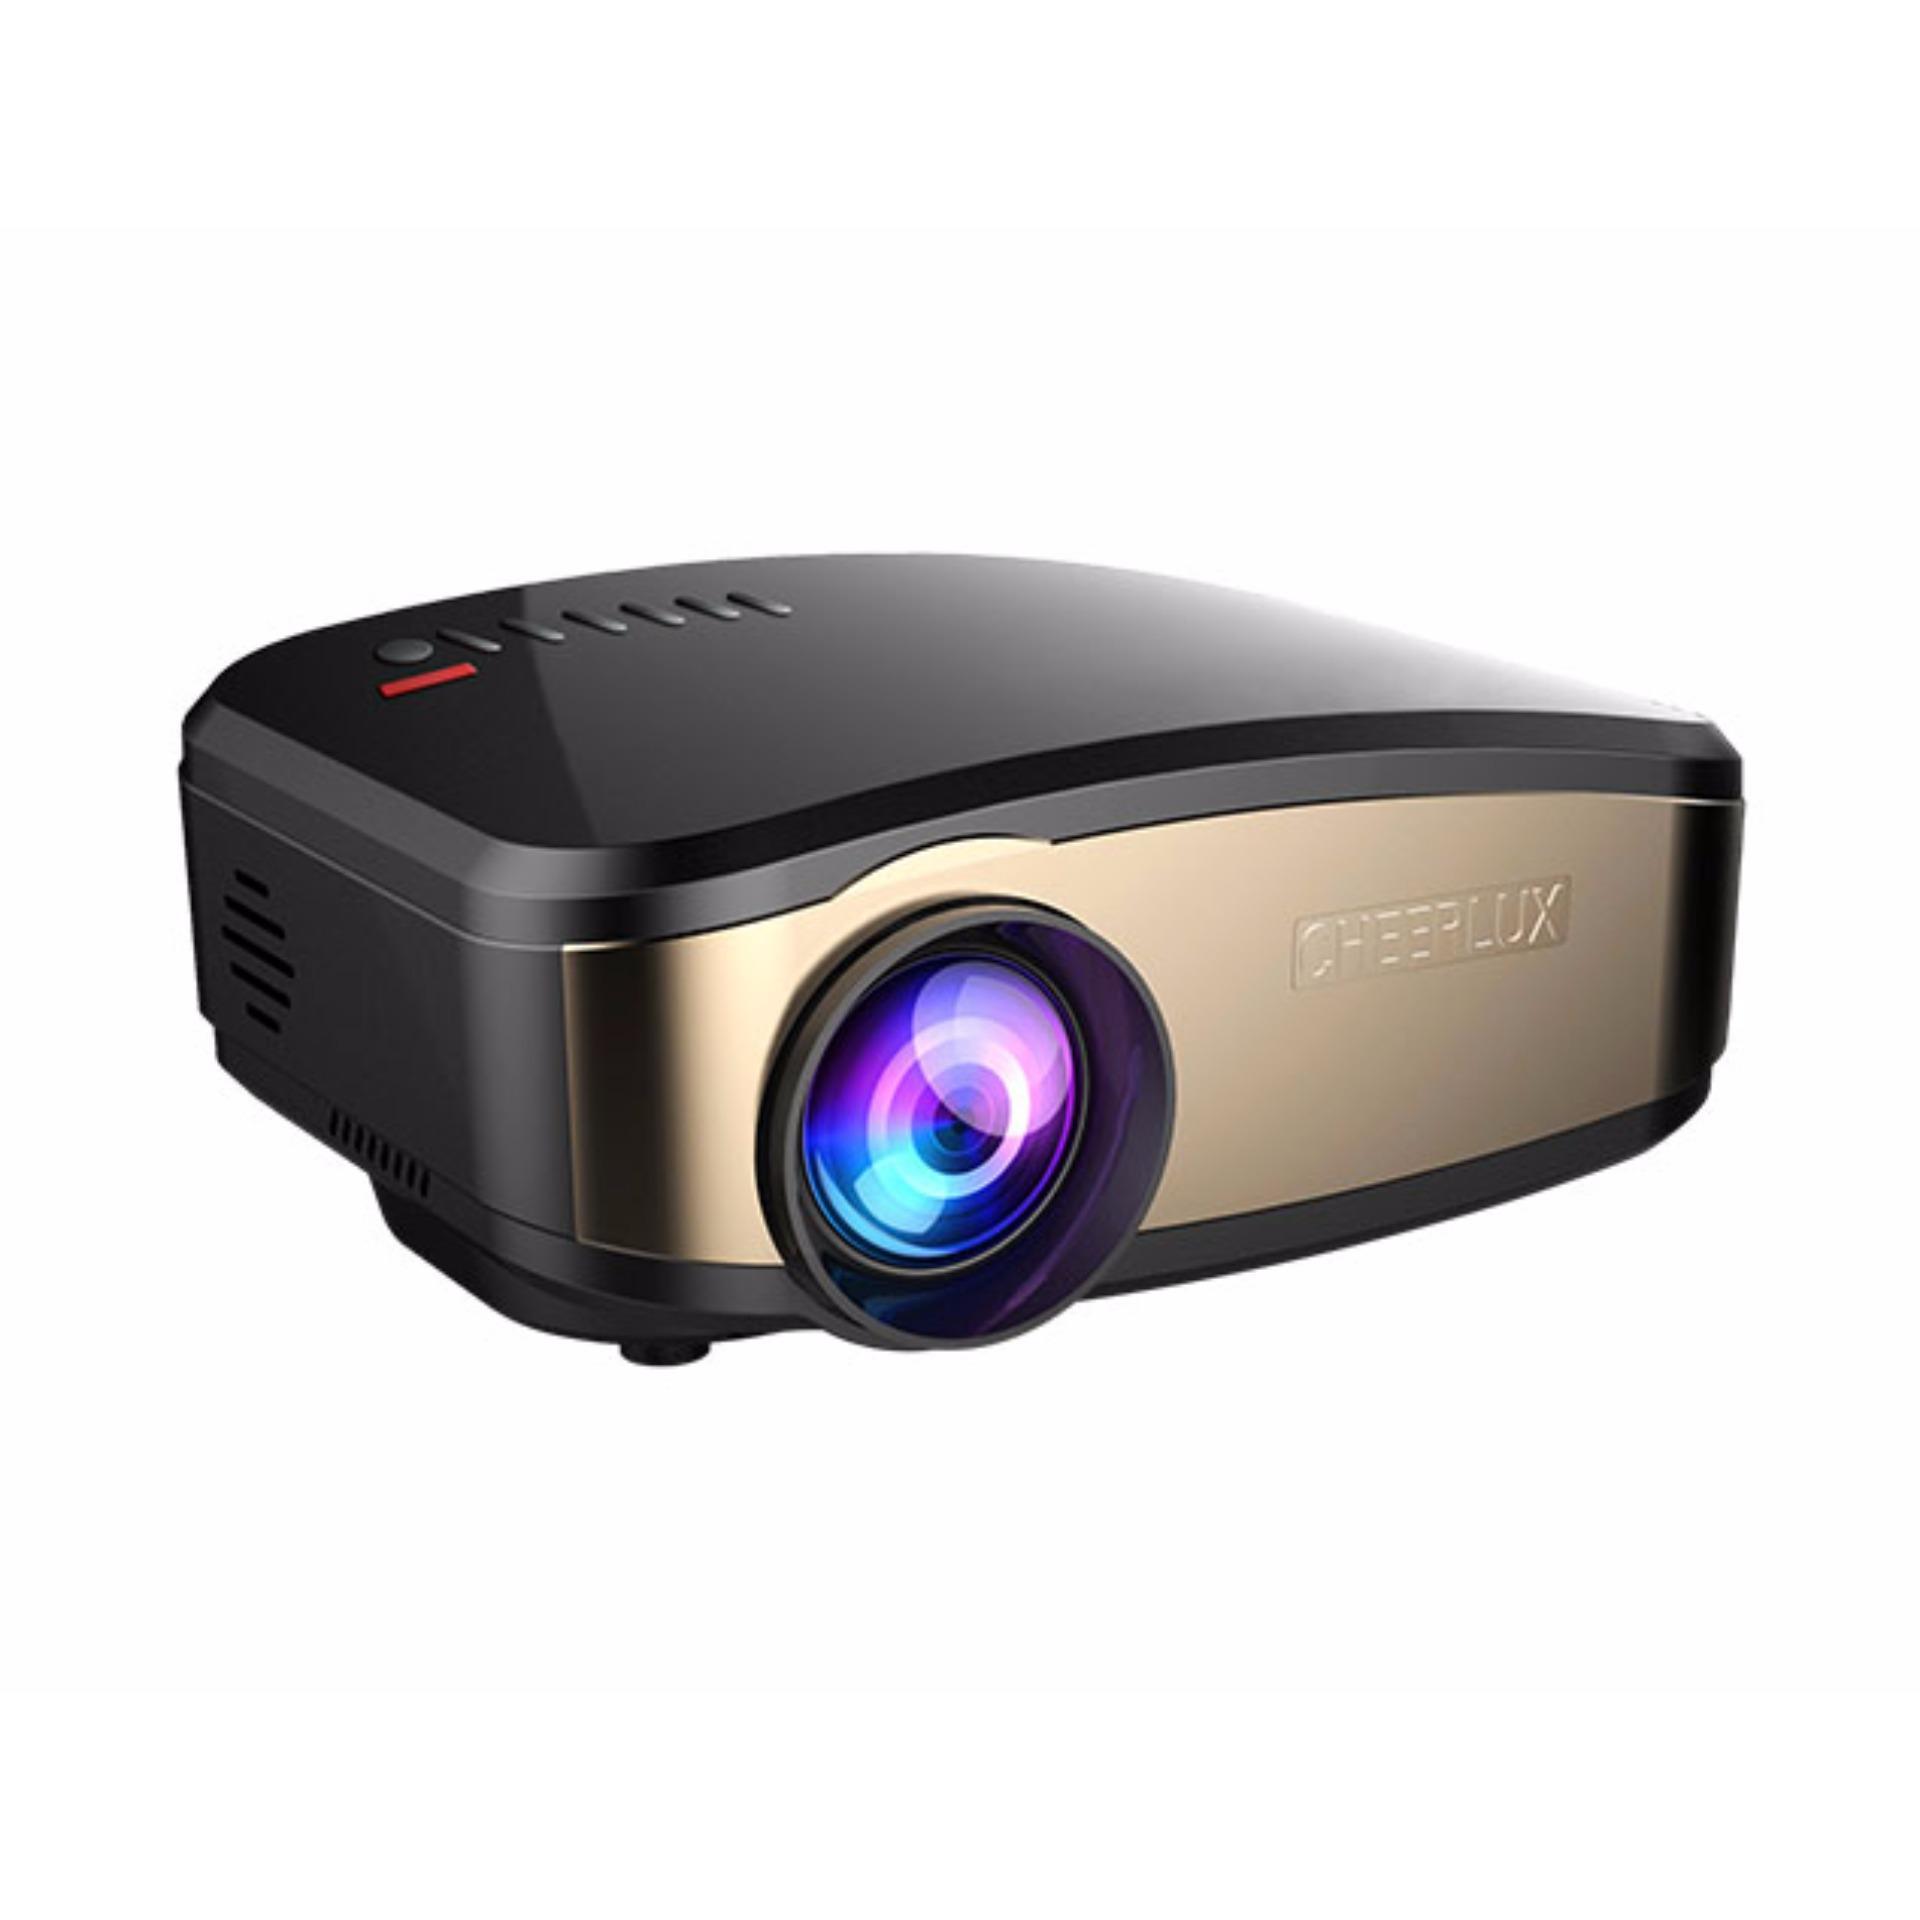 ... Cheerlux C6 Wifi Mini Proyektor with tv tunner vs uc46 , eug600dc6d ...